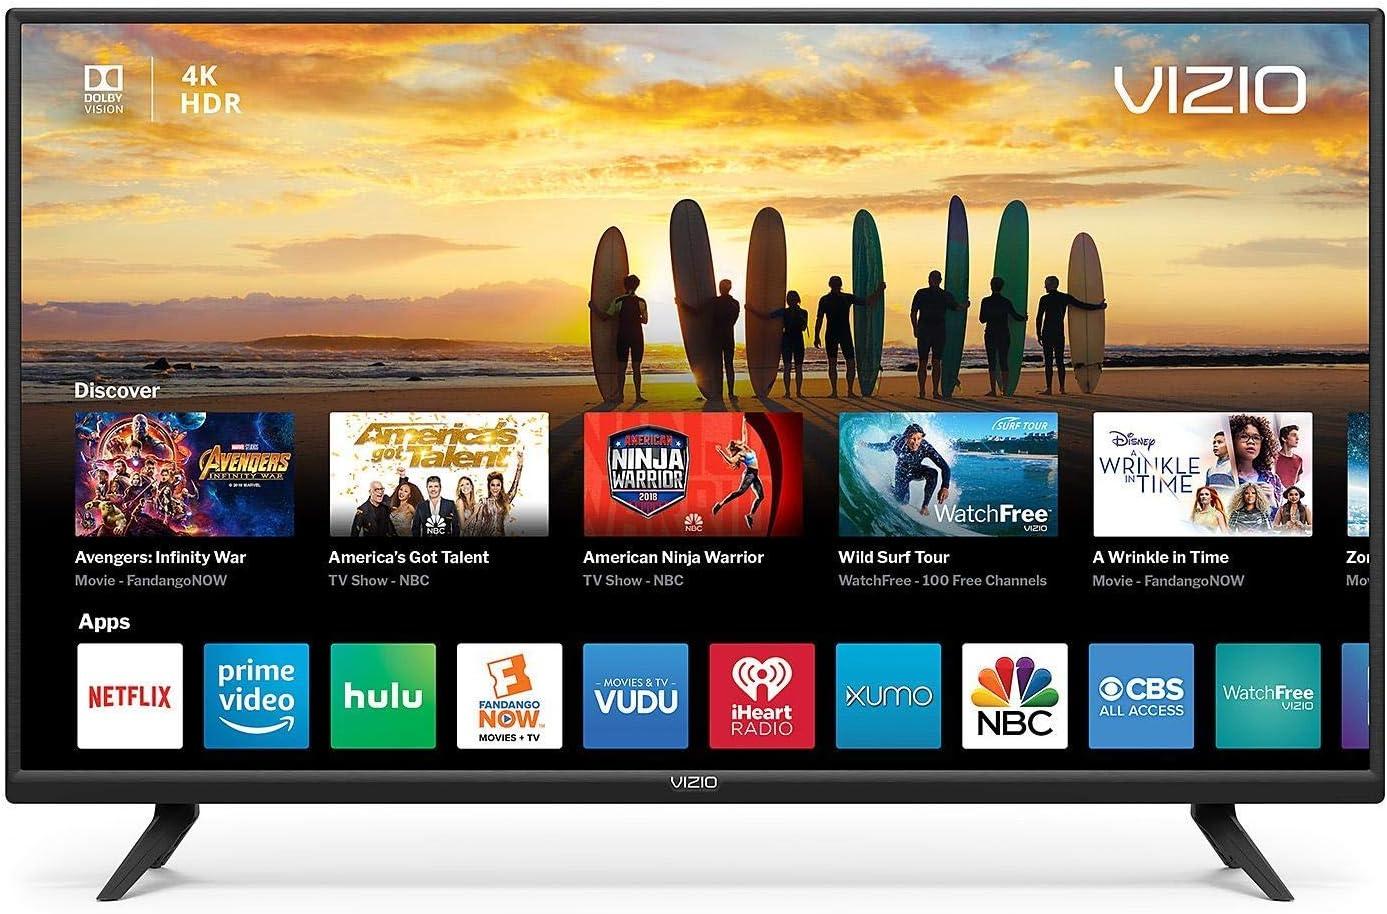 VIZIO V405-G9 40 Inch Class V-Series 4K HDR Smart TV (Renewed)